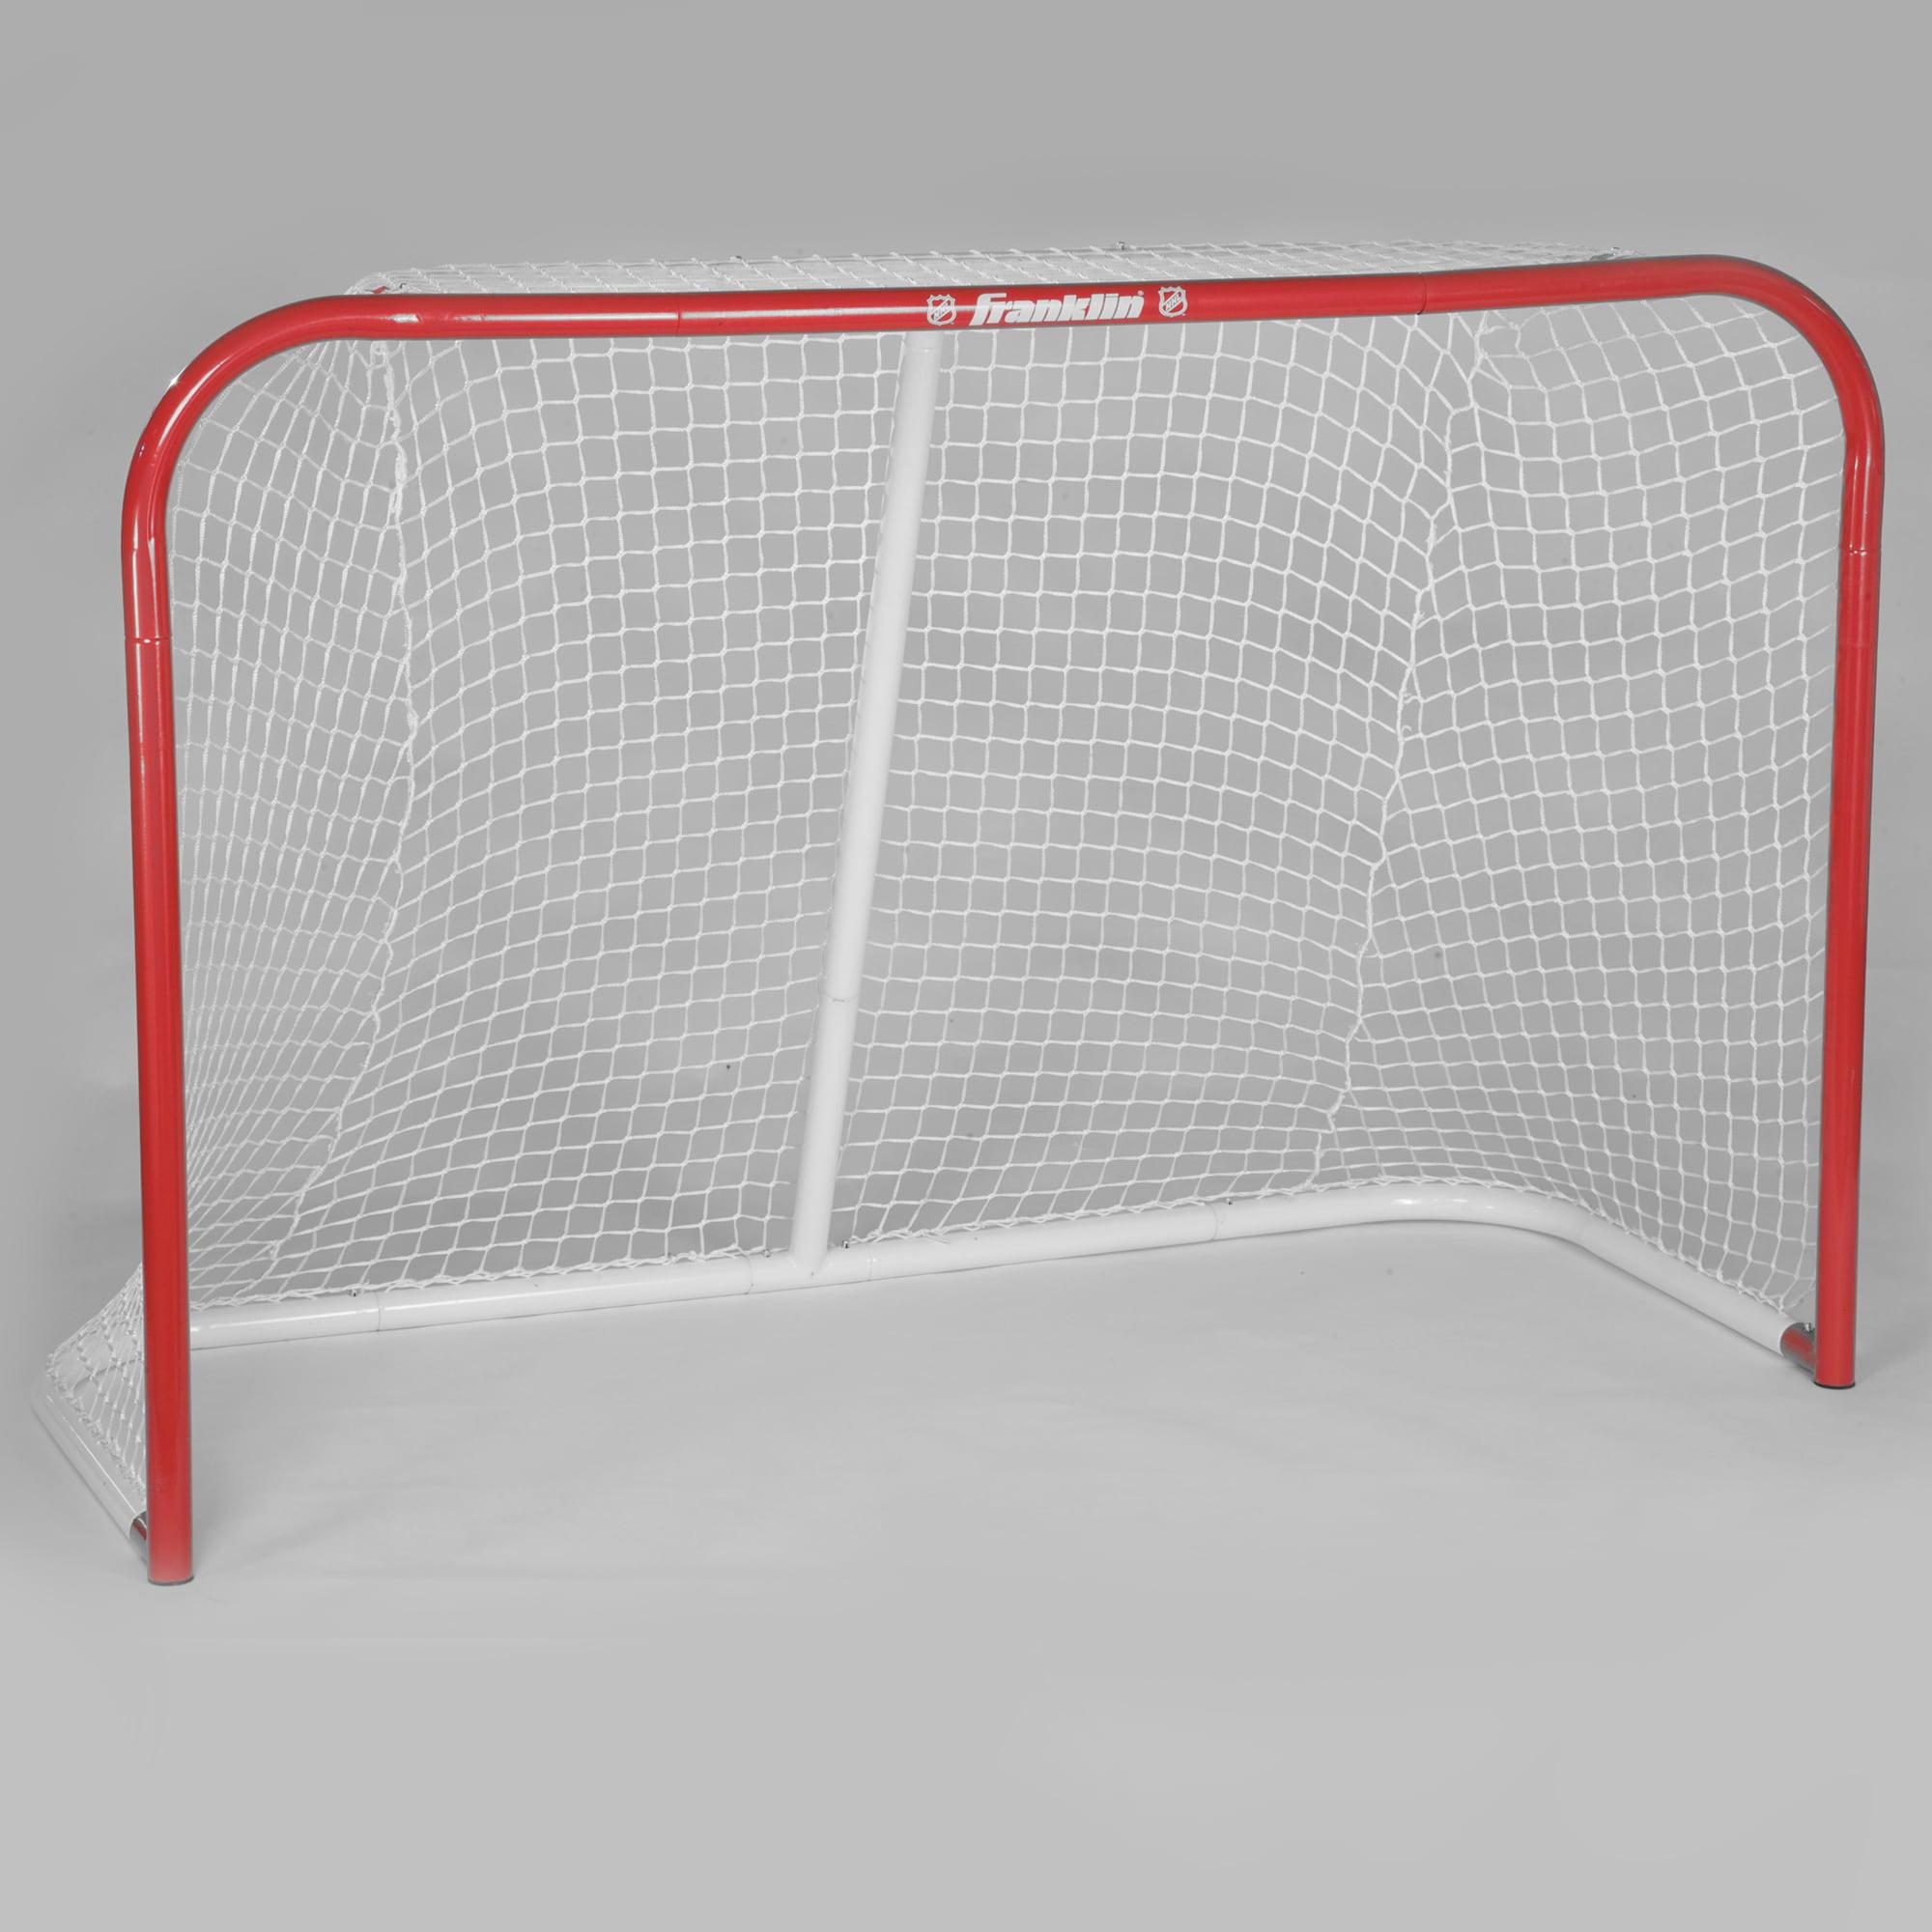 "Franklin Sports Pro 72"" Professional Steel Hockey Goal"